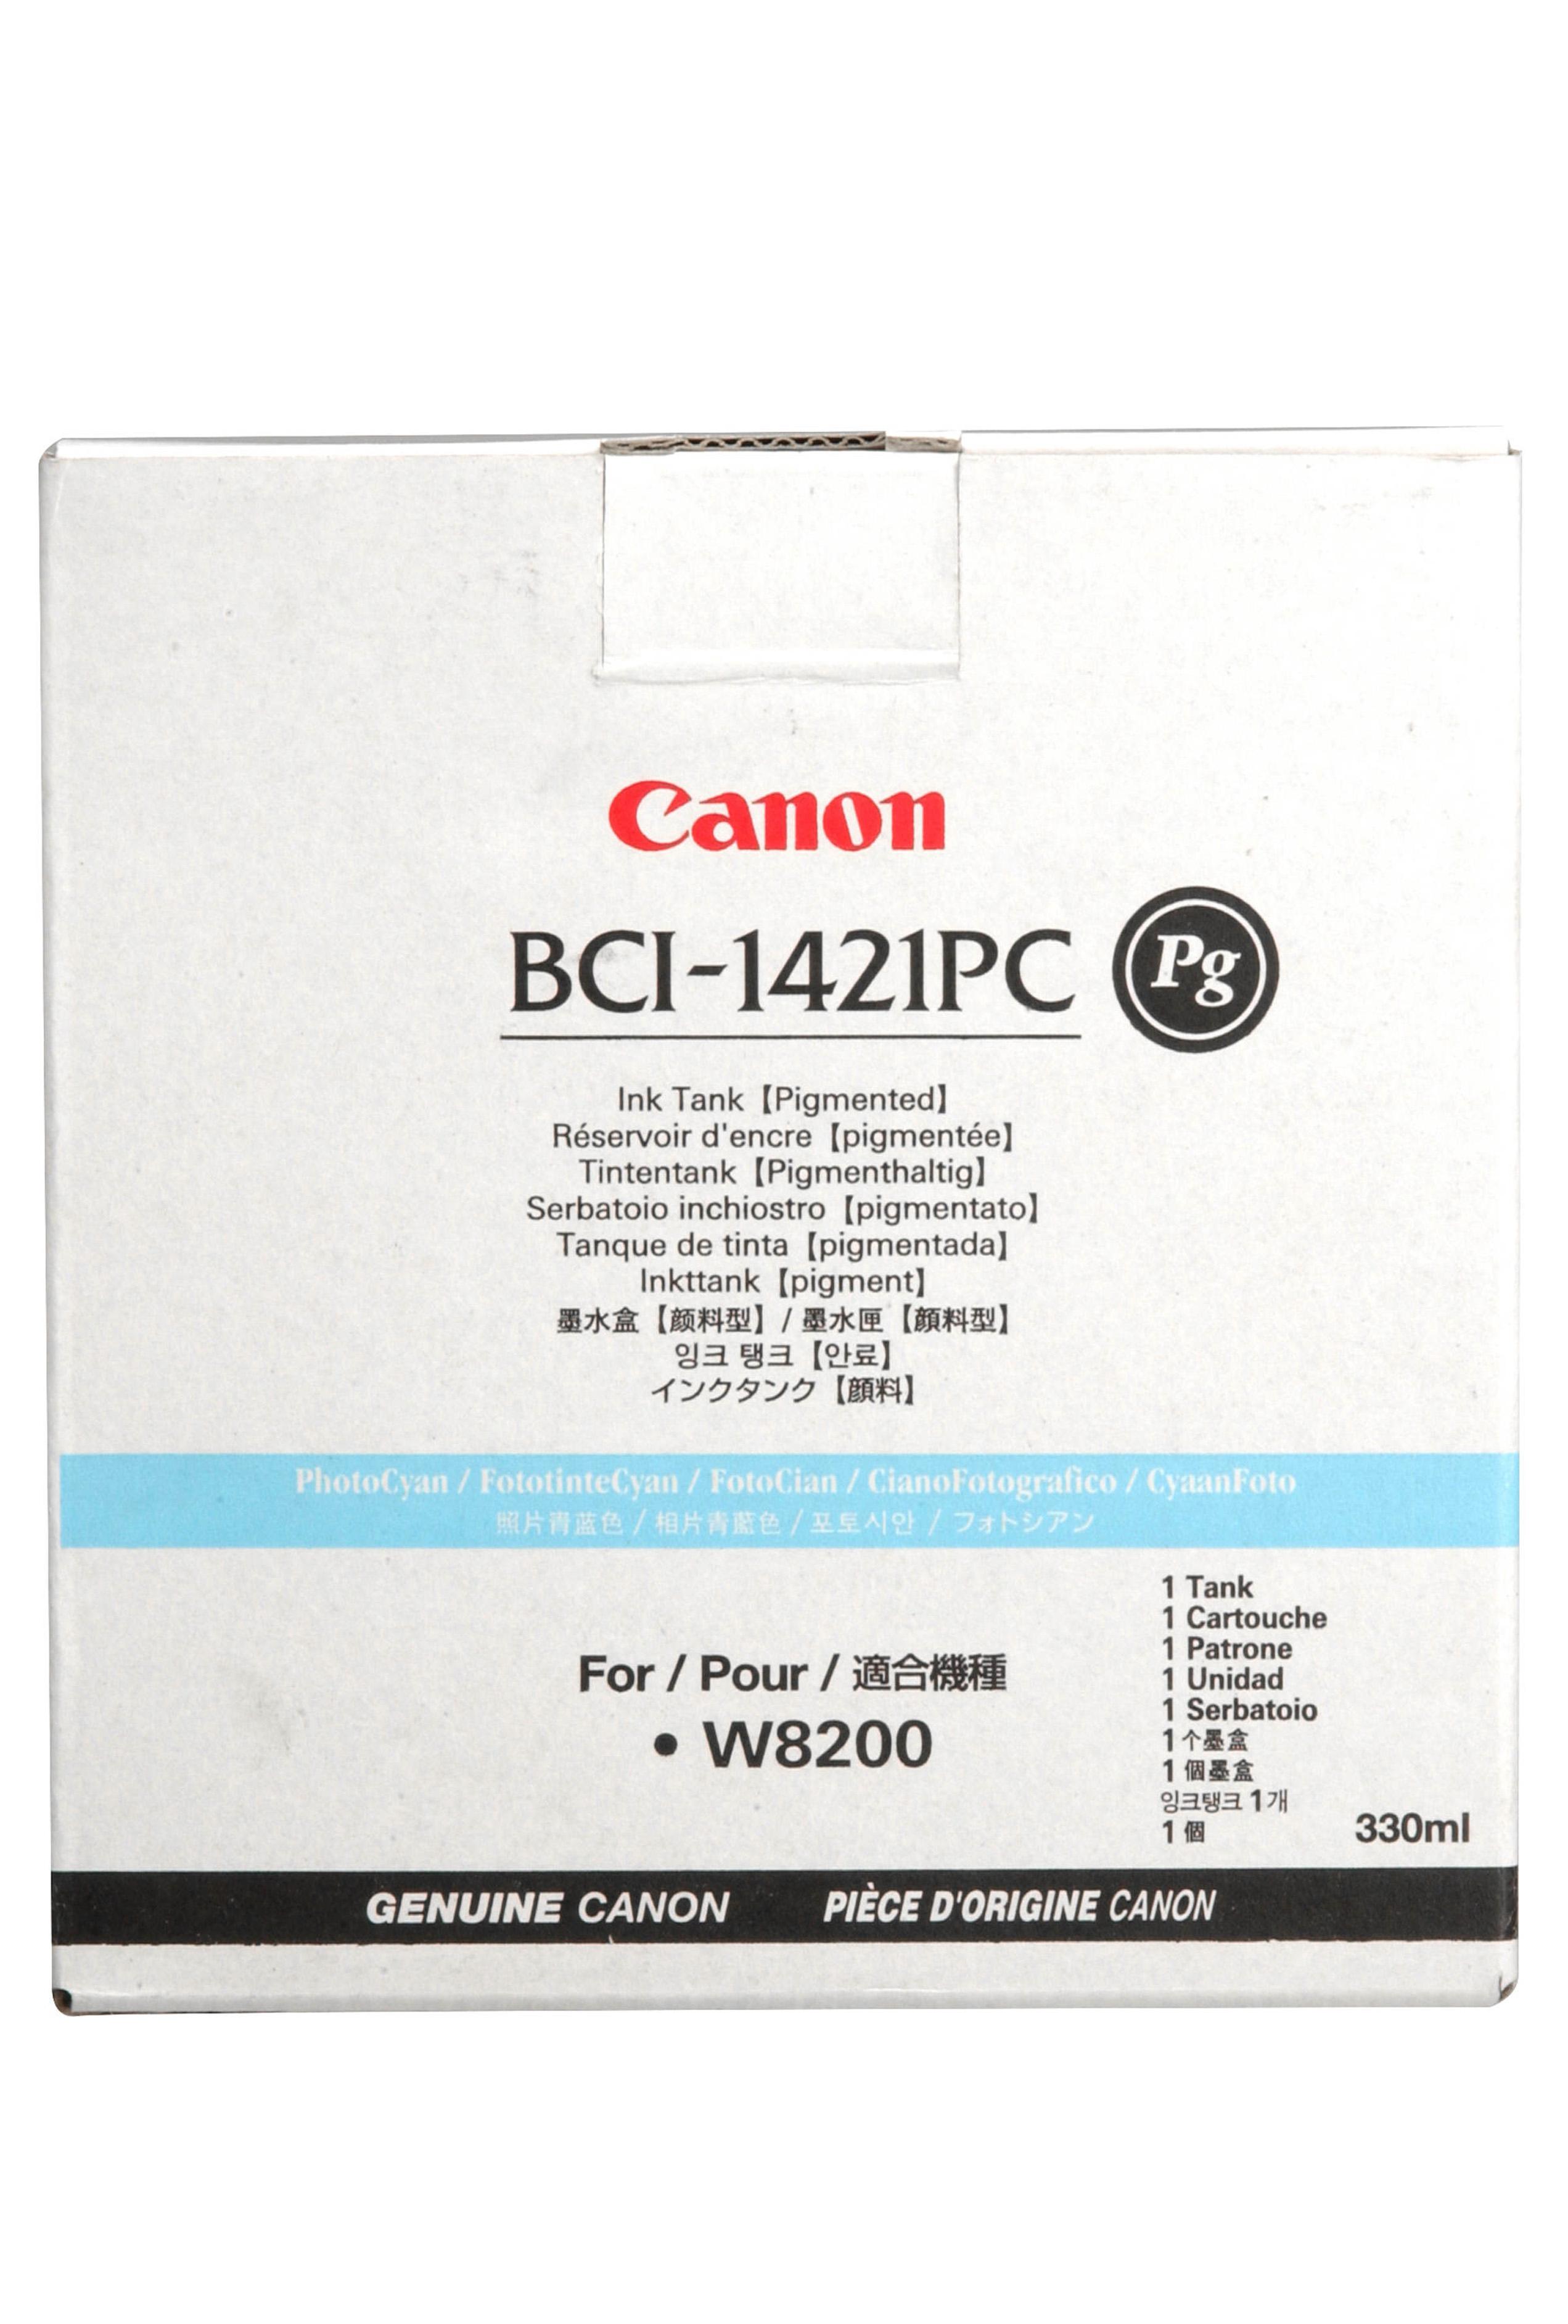 Canon BCI-1421PC - PIGMENT Photo Cyan Ink Tank 330ml (8371A001AA)